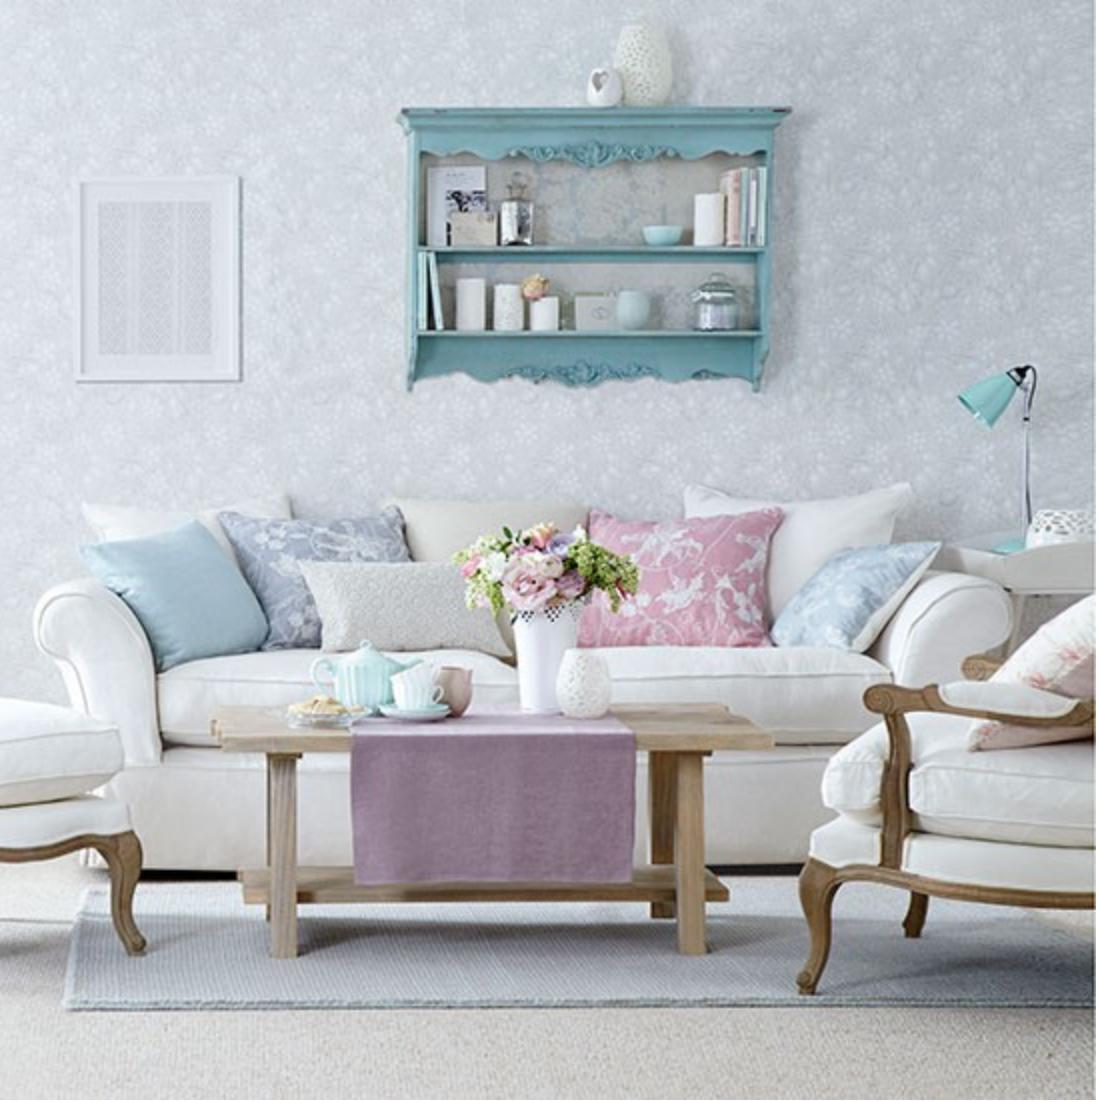 Mesadejantar decorandoonline - Blue and pink living room ideas ...